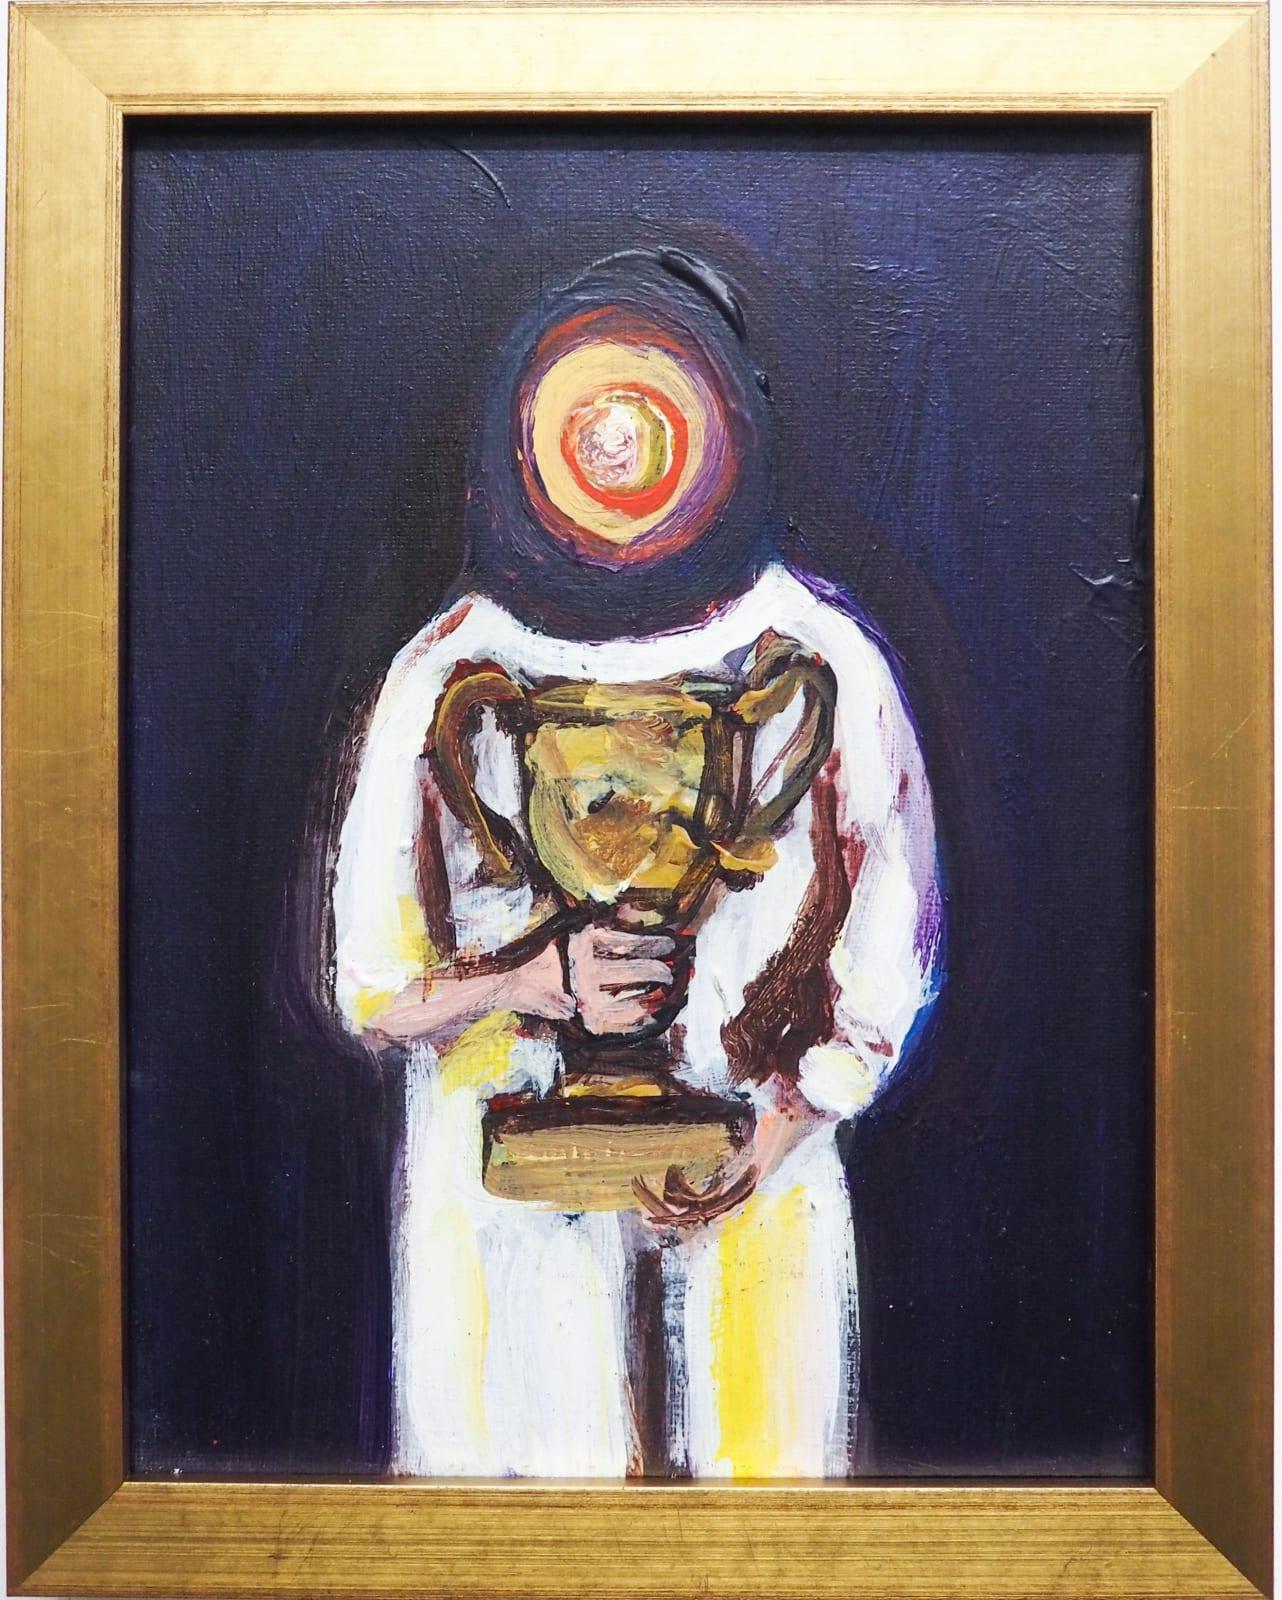 Yassine Balbzioui, easy game 1, 2018 Oil on canvas 22.5 x 17.5 cm (framed)